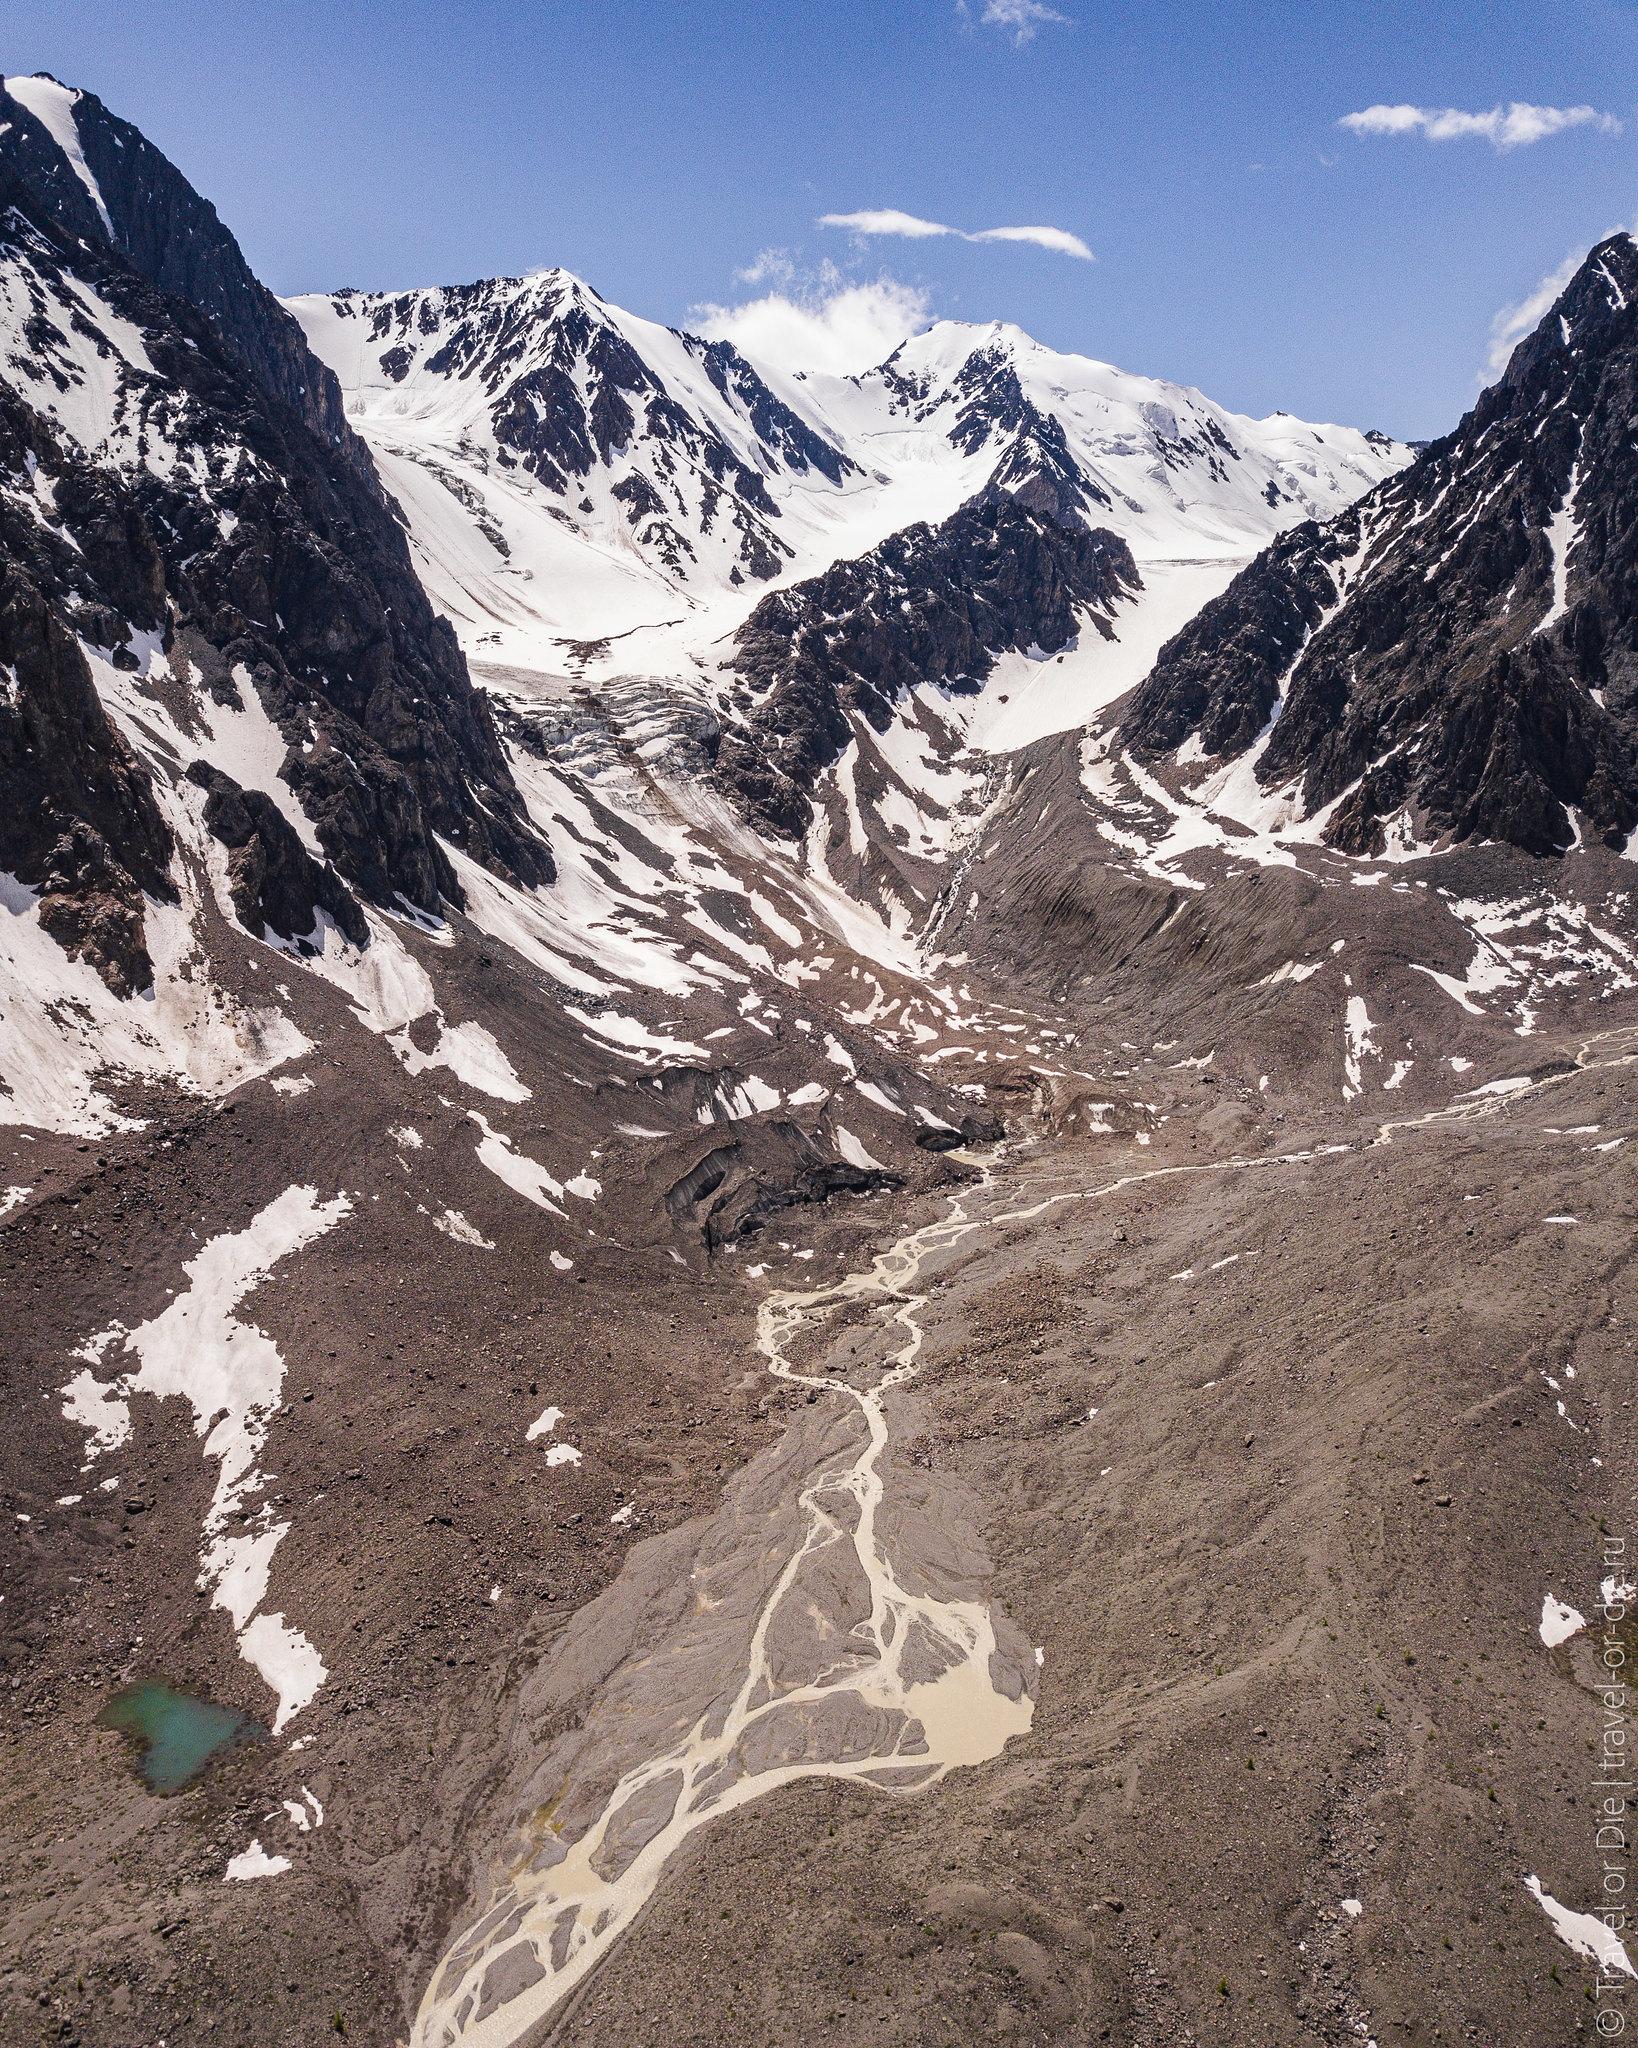 Aktru-Glacier-Altay-Ледник-Актру-Алтай-dji-mavic-0558